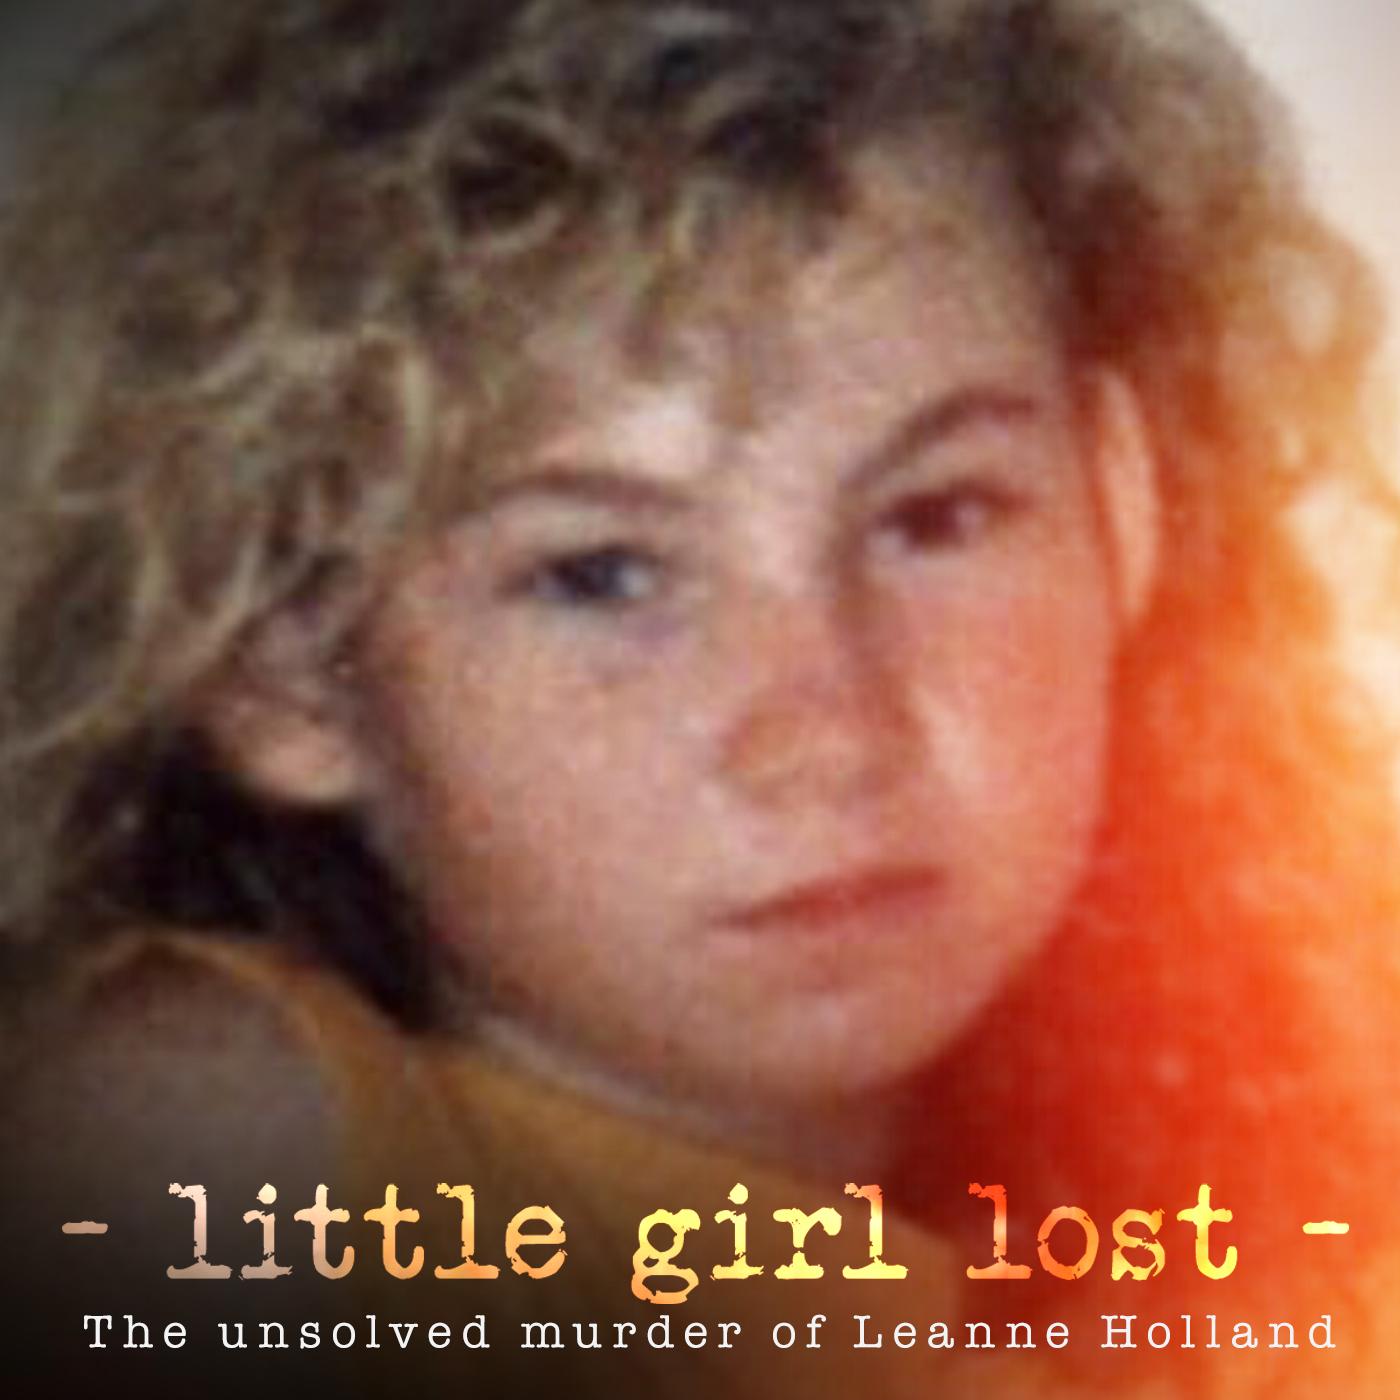 little girl lost Watch little girl lost online stream the twilight zone season 3, episode 26 instantly.